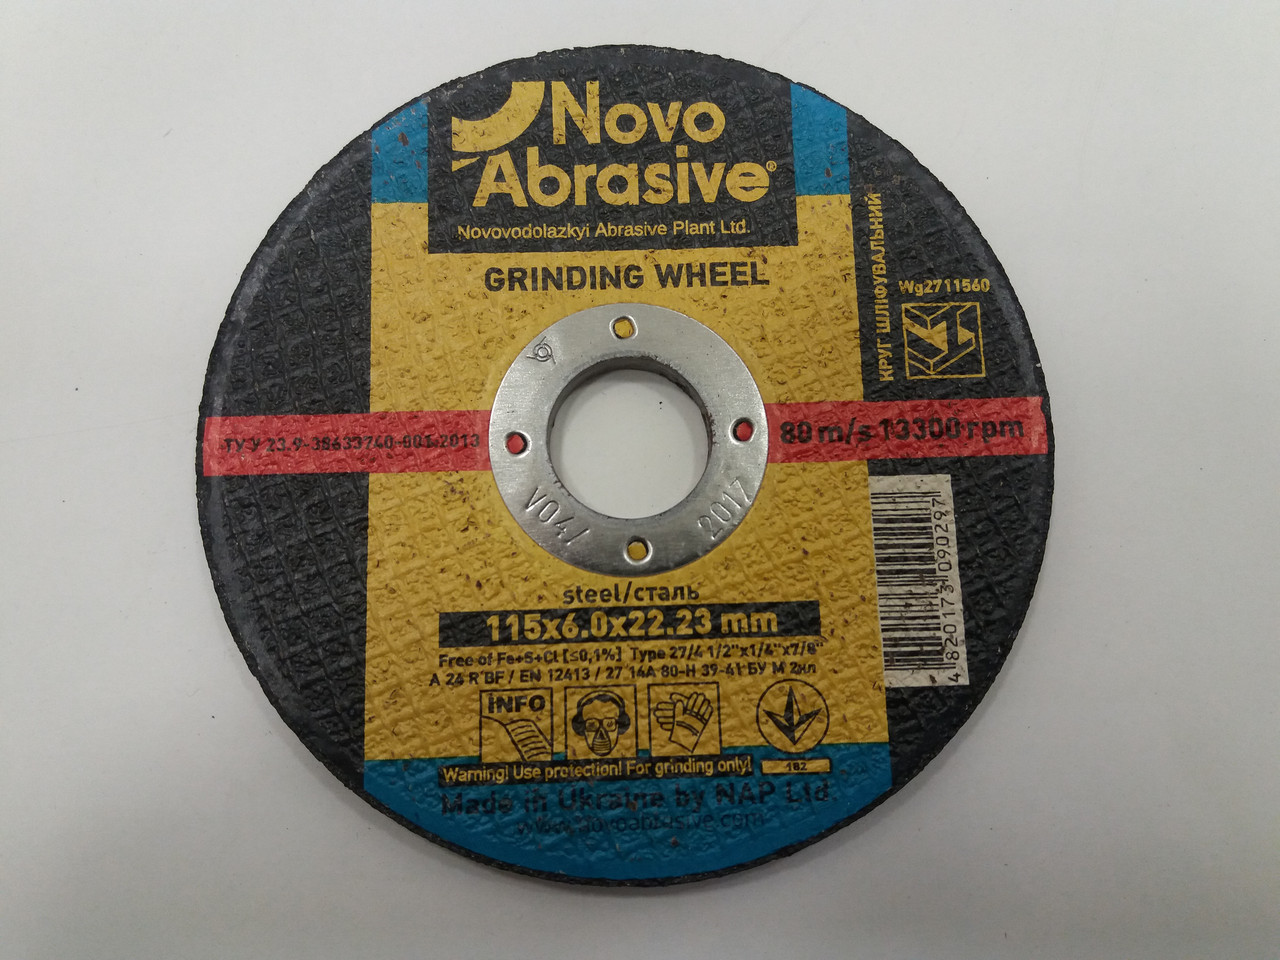 Круг зачистной Novo Abrasive 115х6,0х22,23